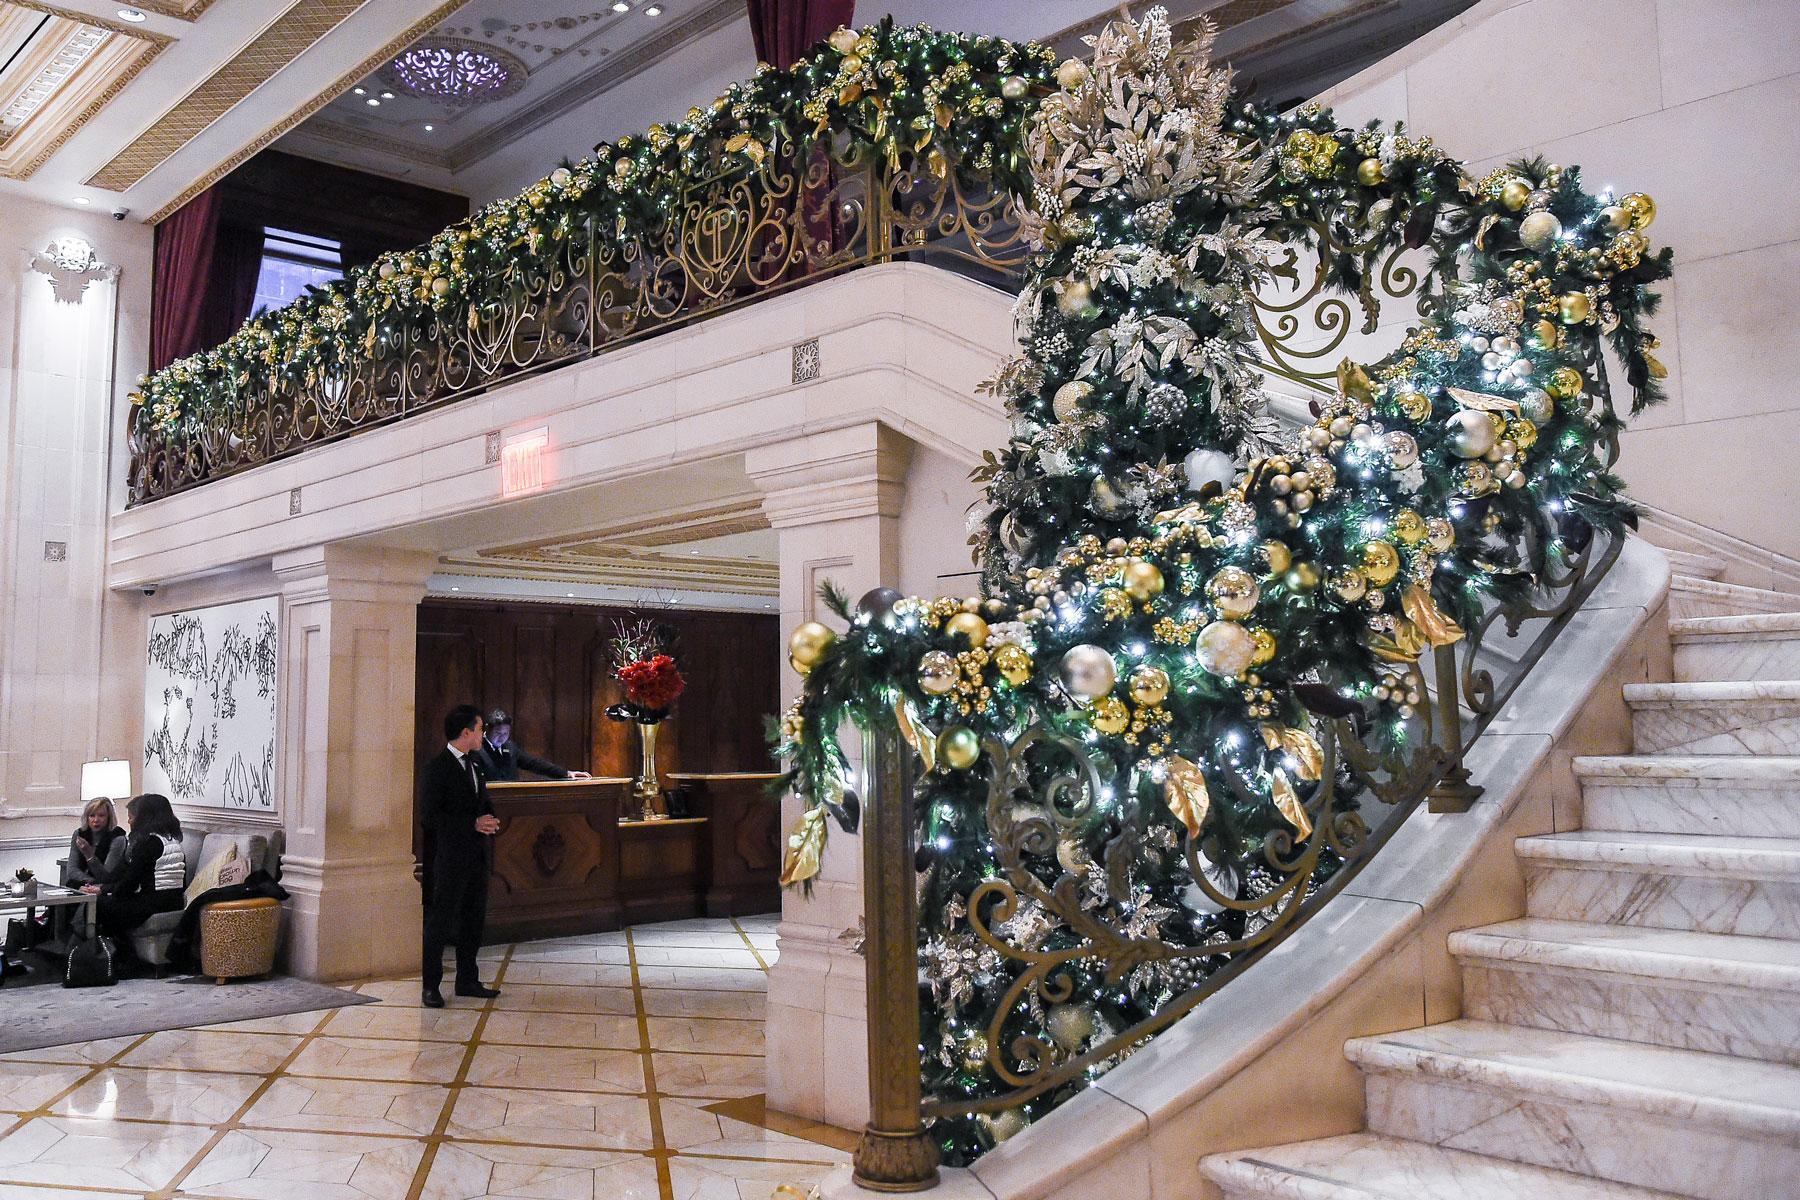 14 Nyc Christmas Trees Besides Rockefeller Center